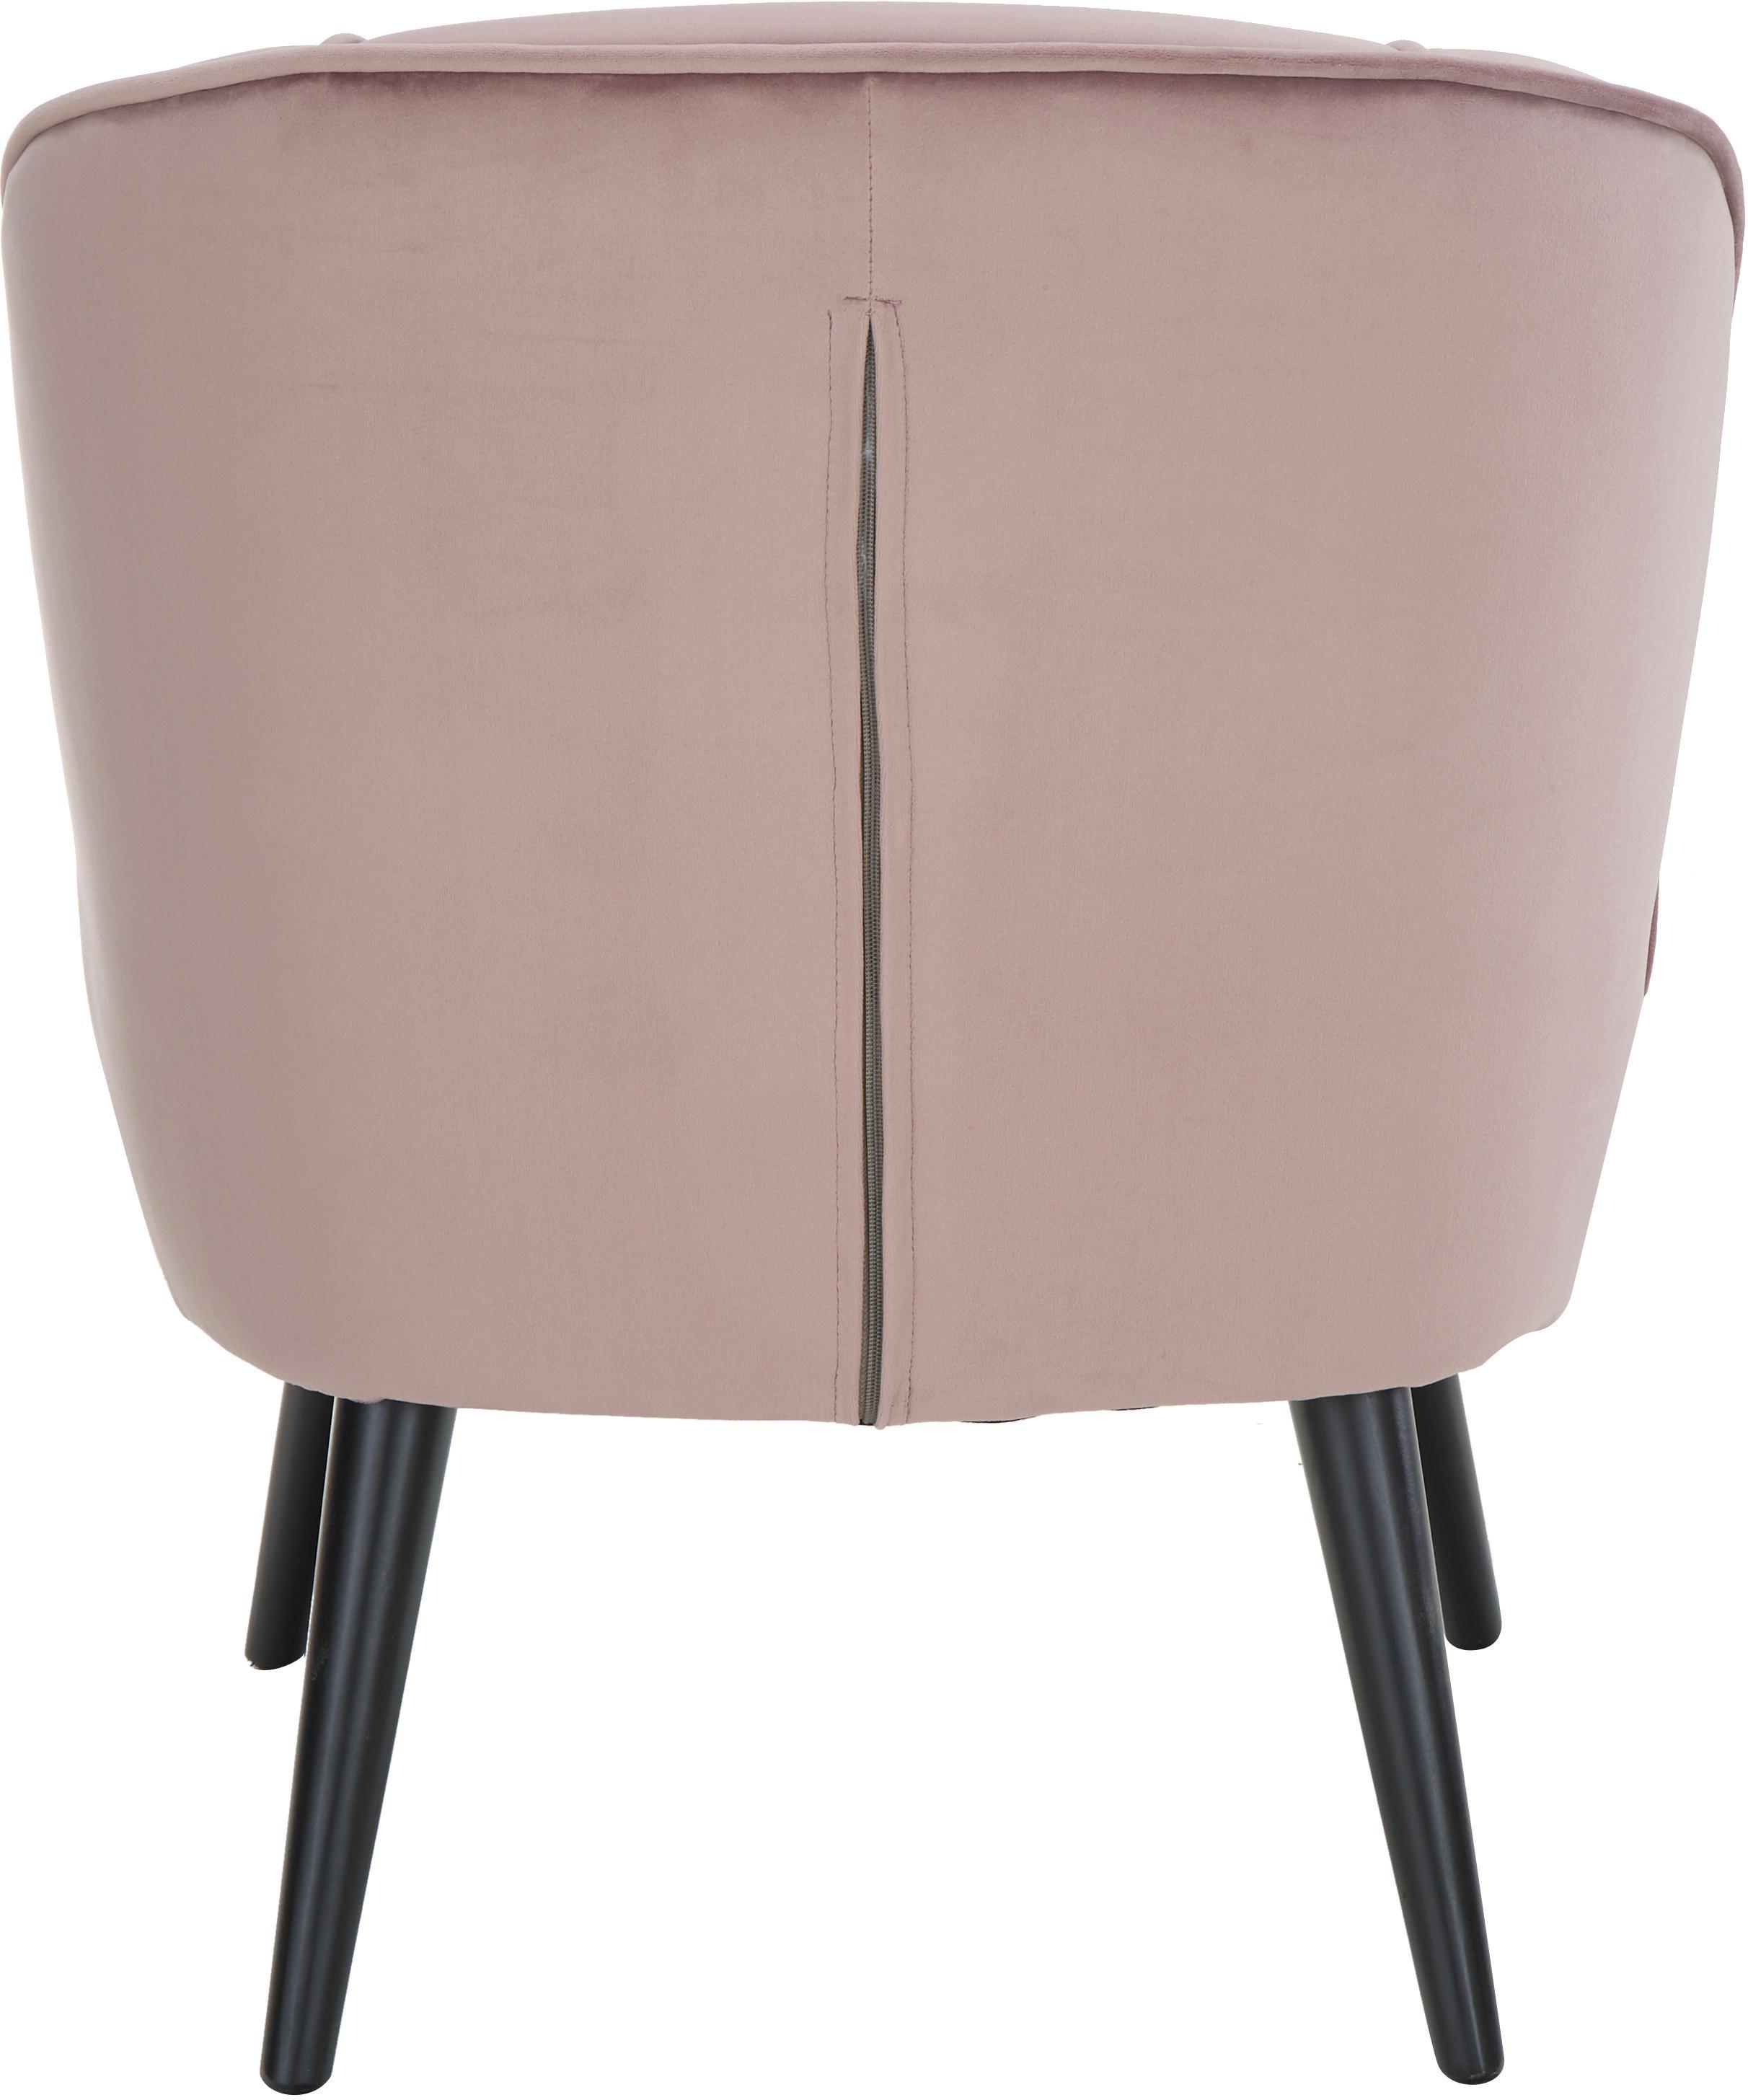 Samt-Cocktailsessel Lucky in Altrosa, Bezug: Samt (Polyester) 30.000 S, Füße: Kautschukholz, lackiert, Samt Altrosa, B 59 x T 68 cm